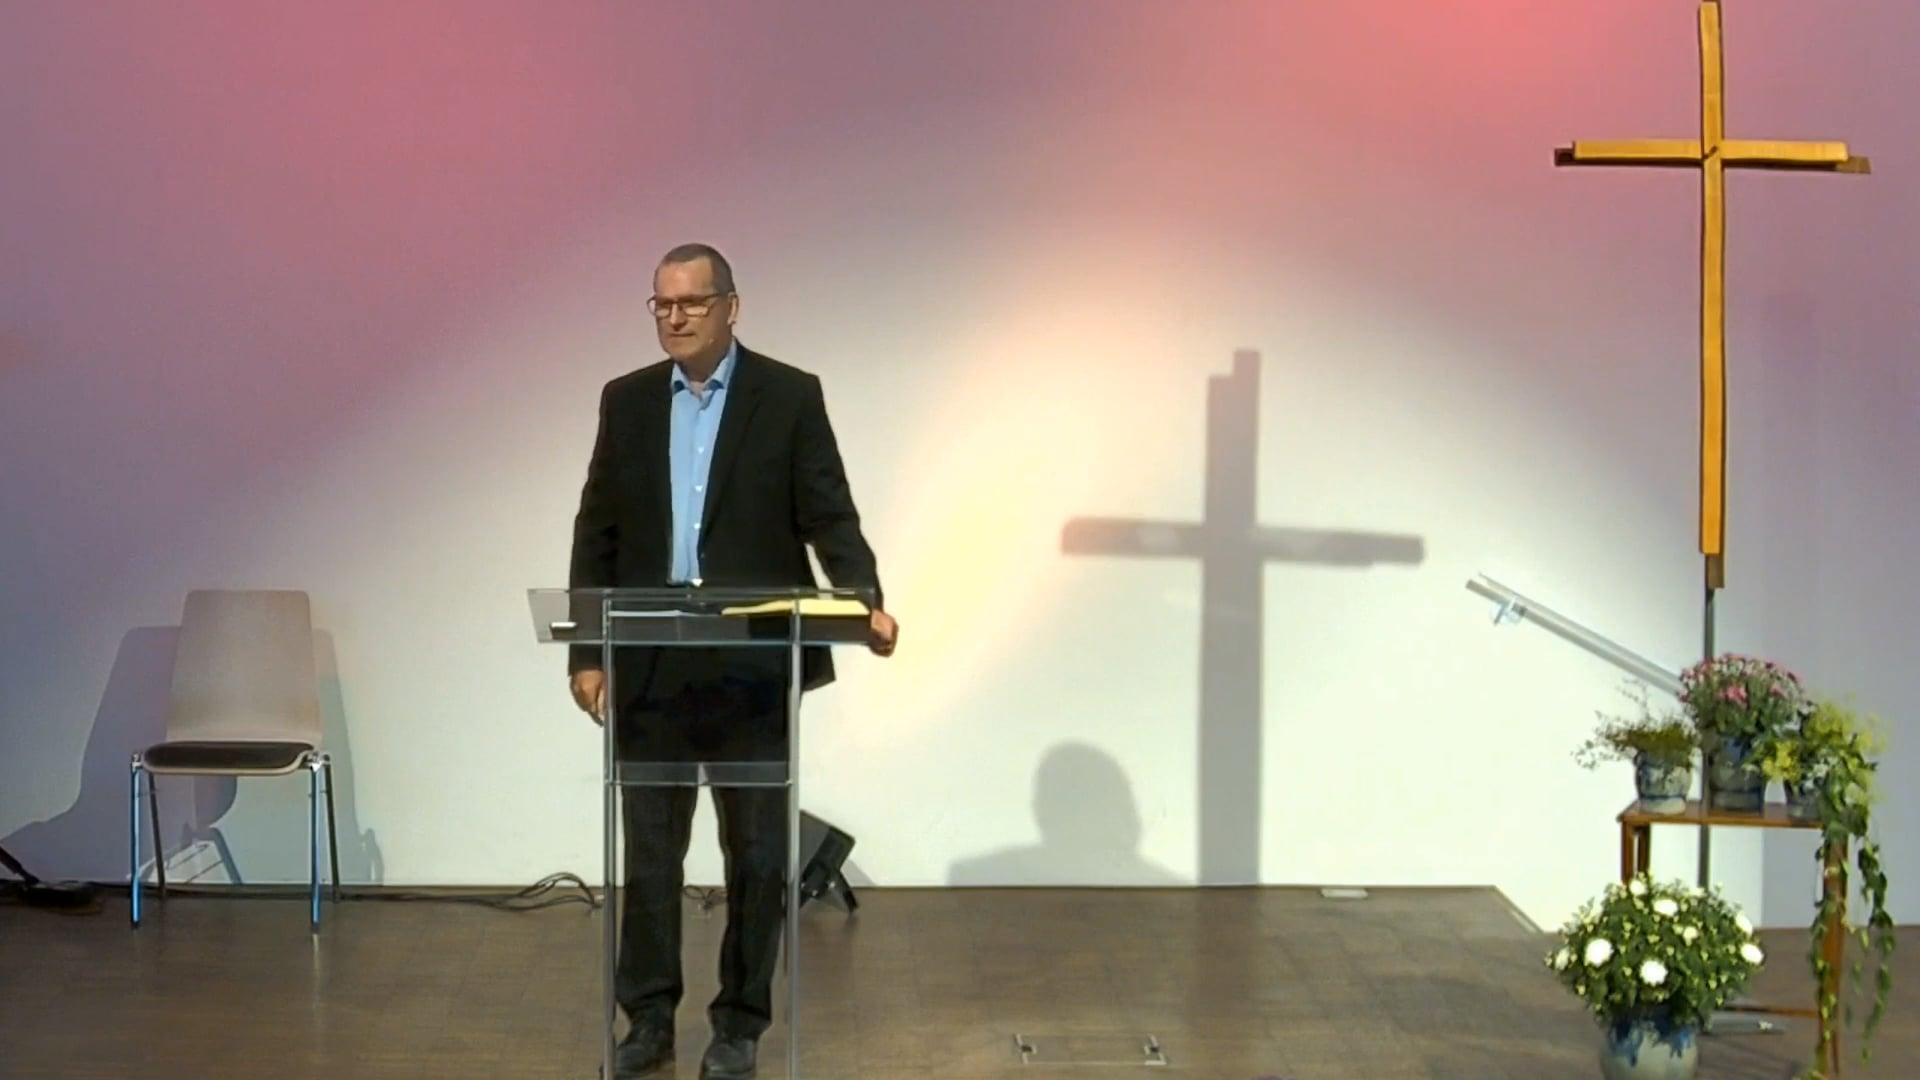 Morgengottesdienst 19.09.2021 / Stefan Schweyer